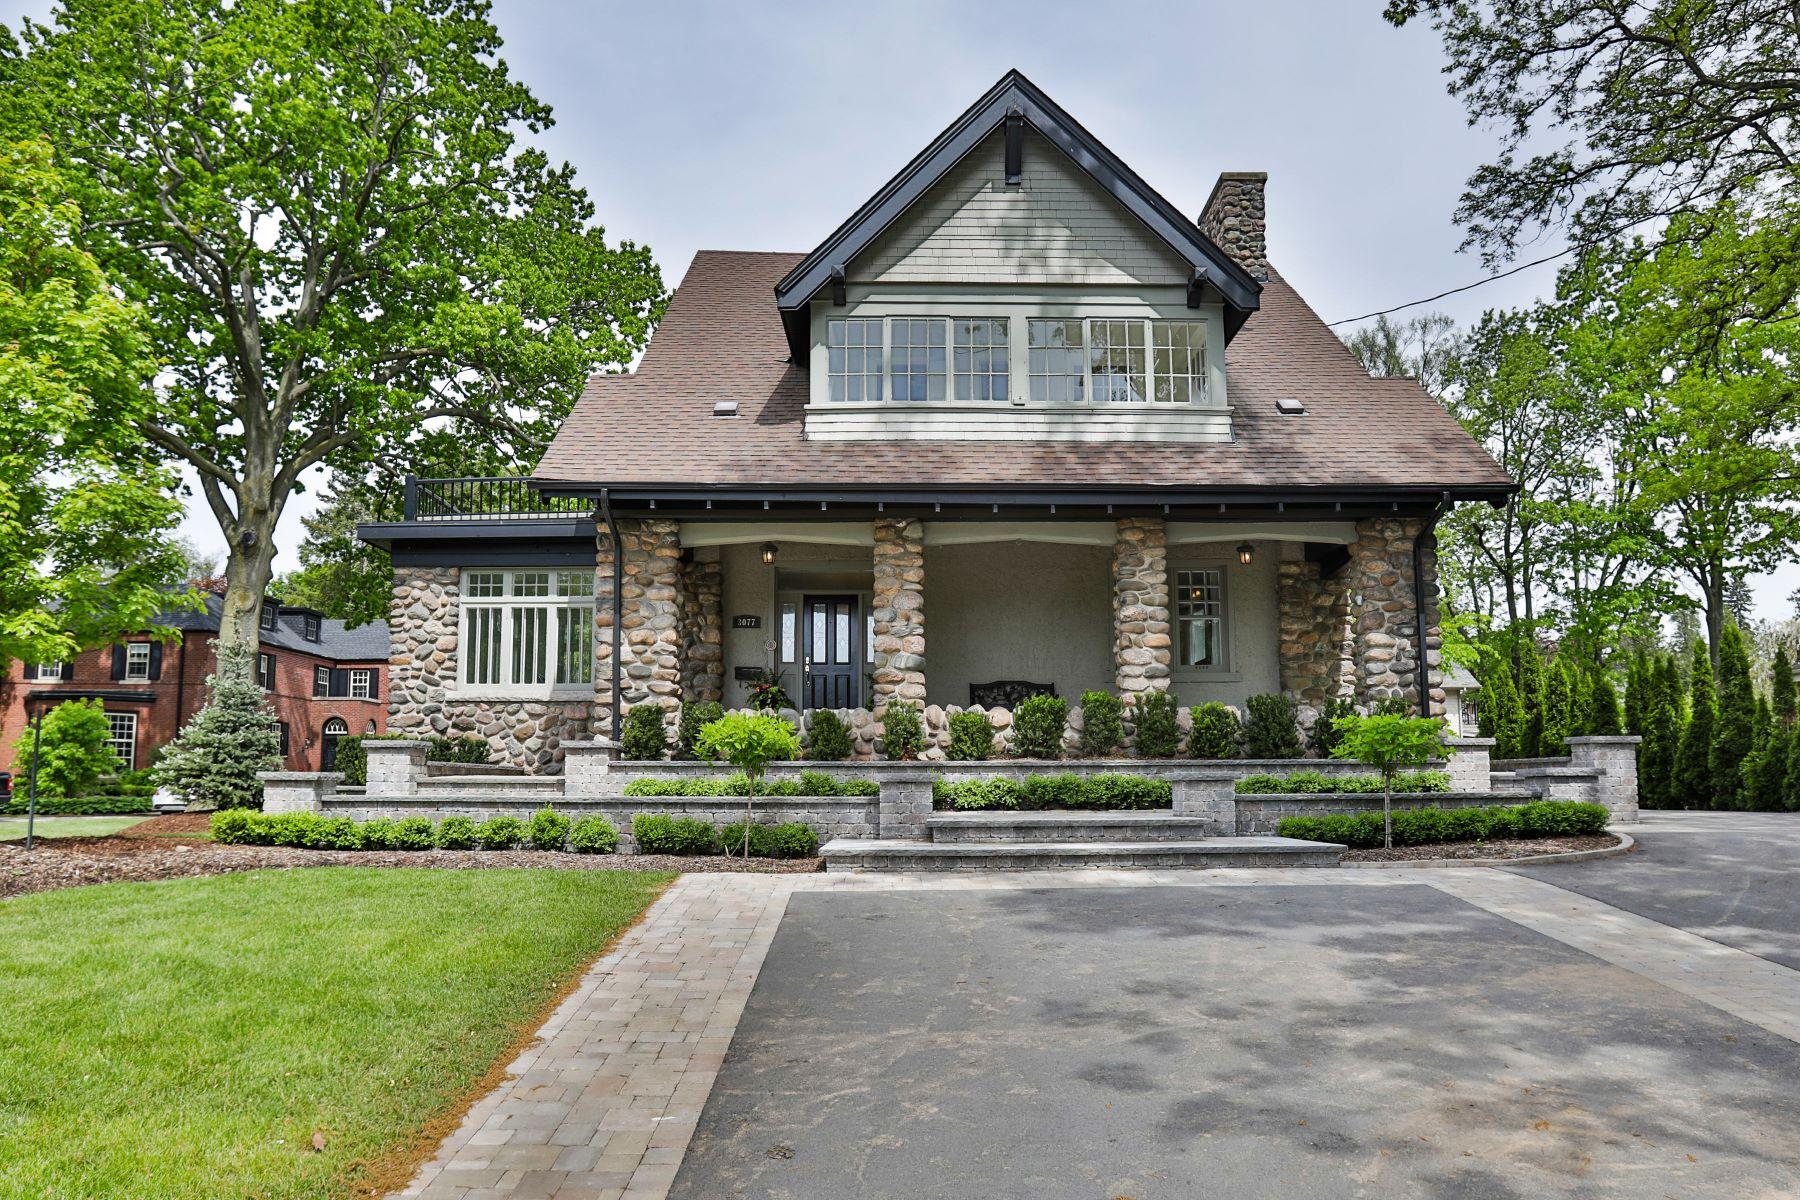 Single Family Homes for Sale at Historical Roseland Gem 3077 Lakeshore Road Burlington, Ontario L7N 1A3 Canada